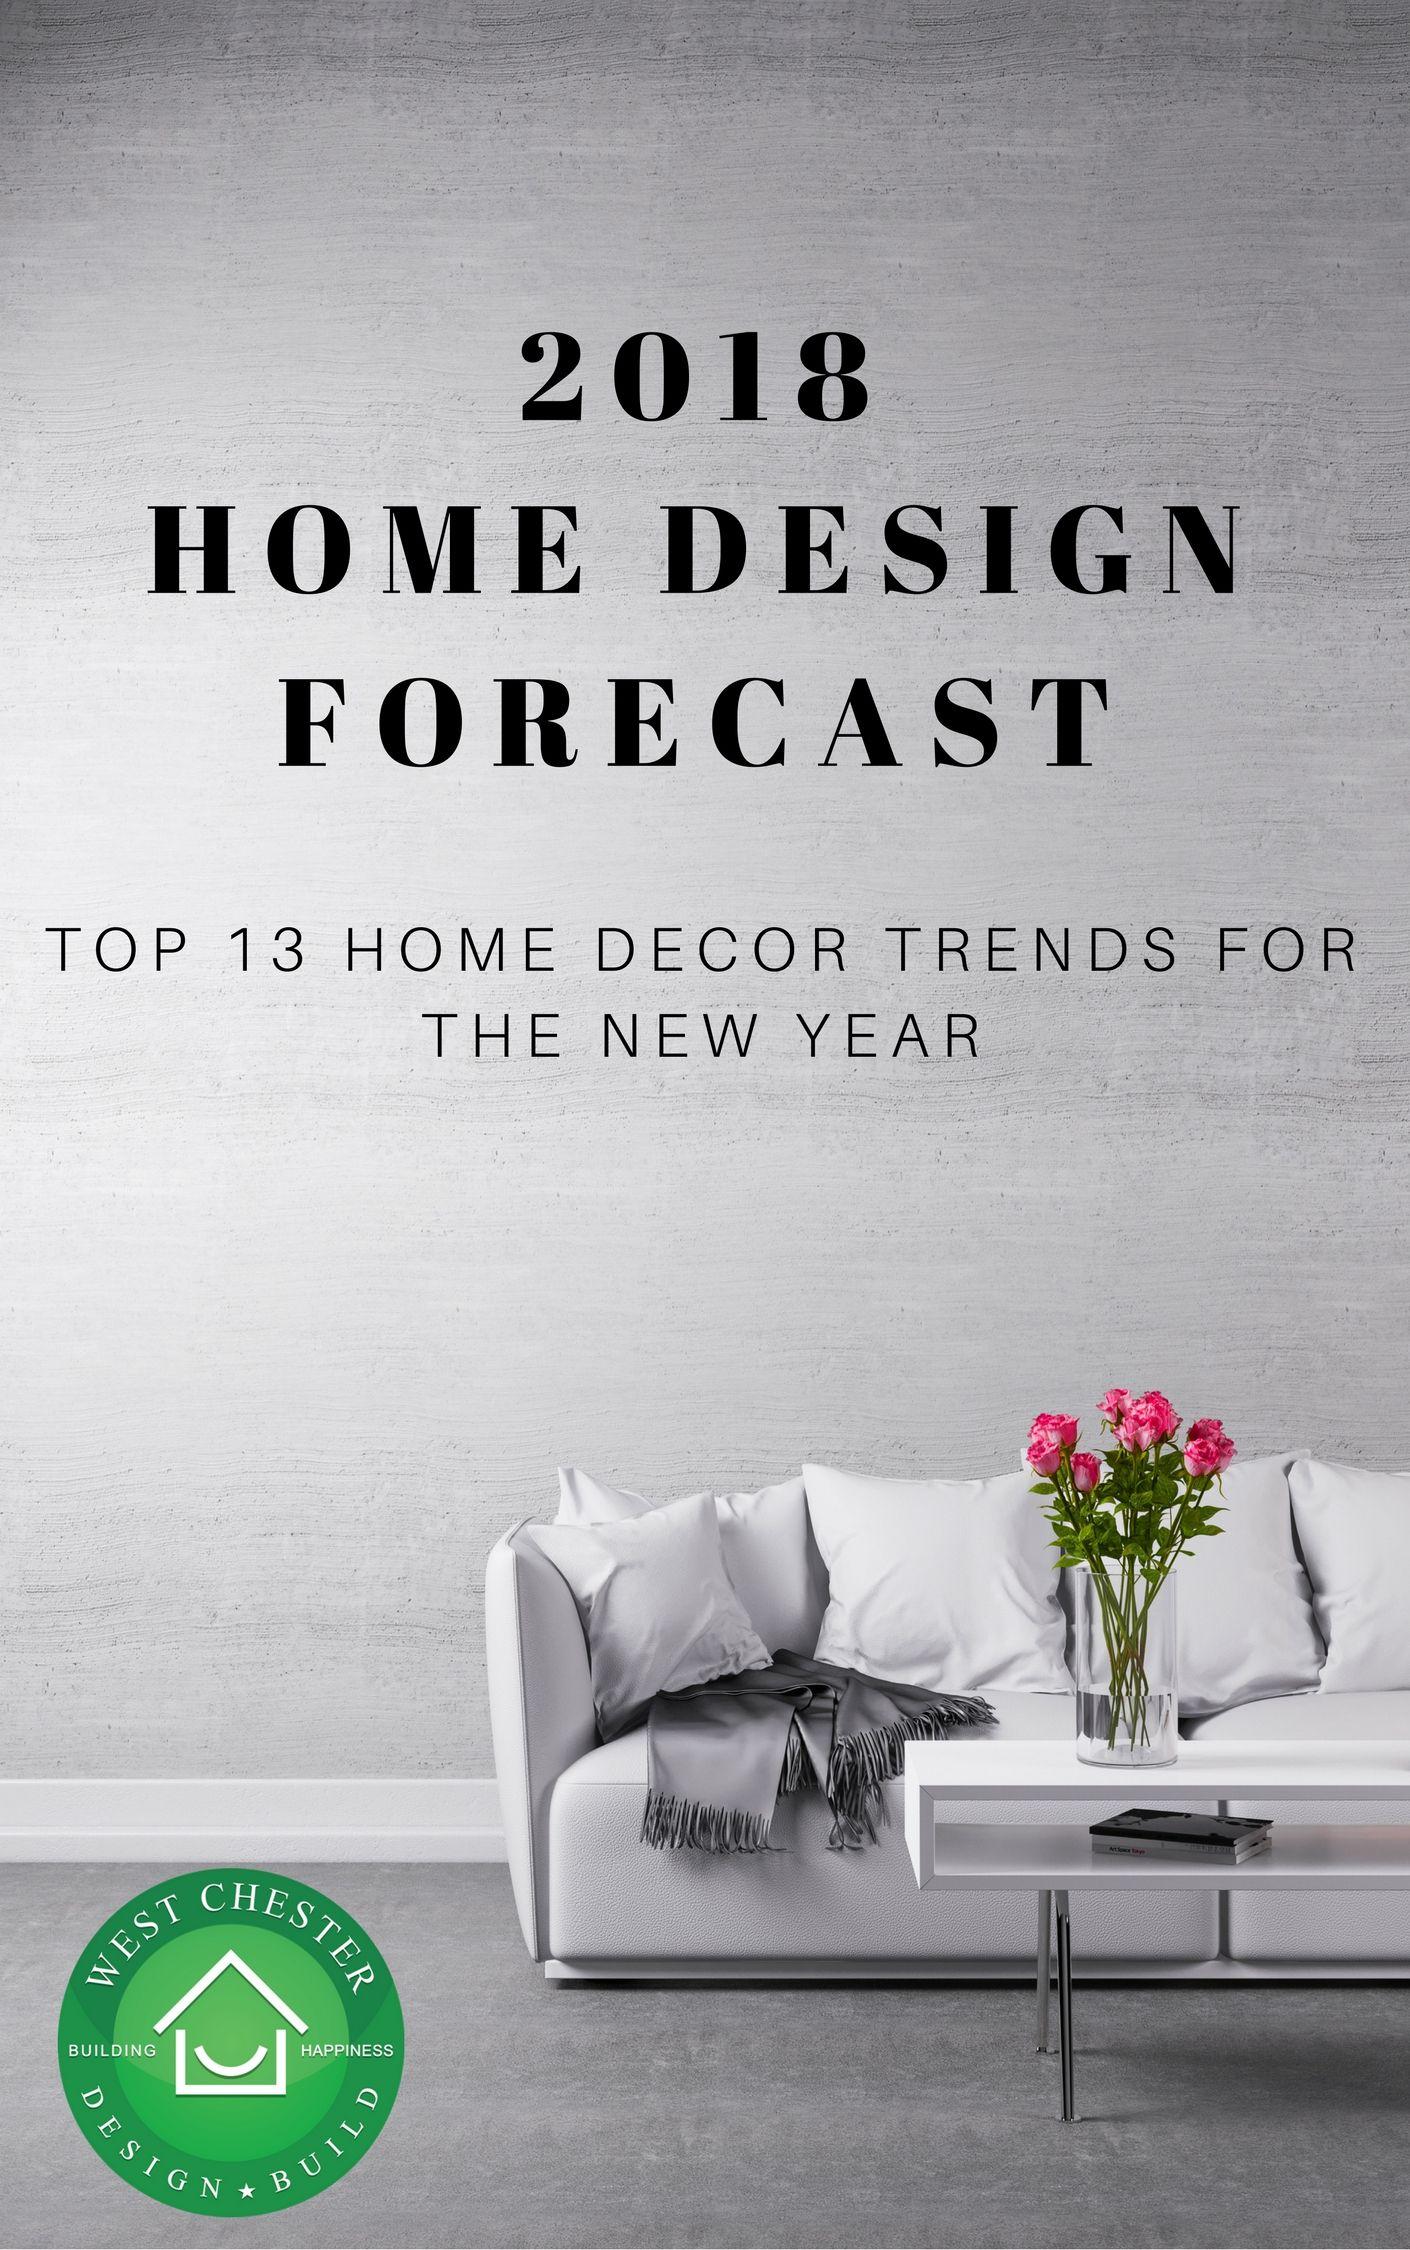 Top 13 Home Design Trends 2018 Design Trends 2018 2018 Interior